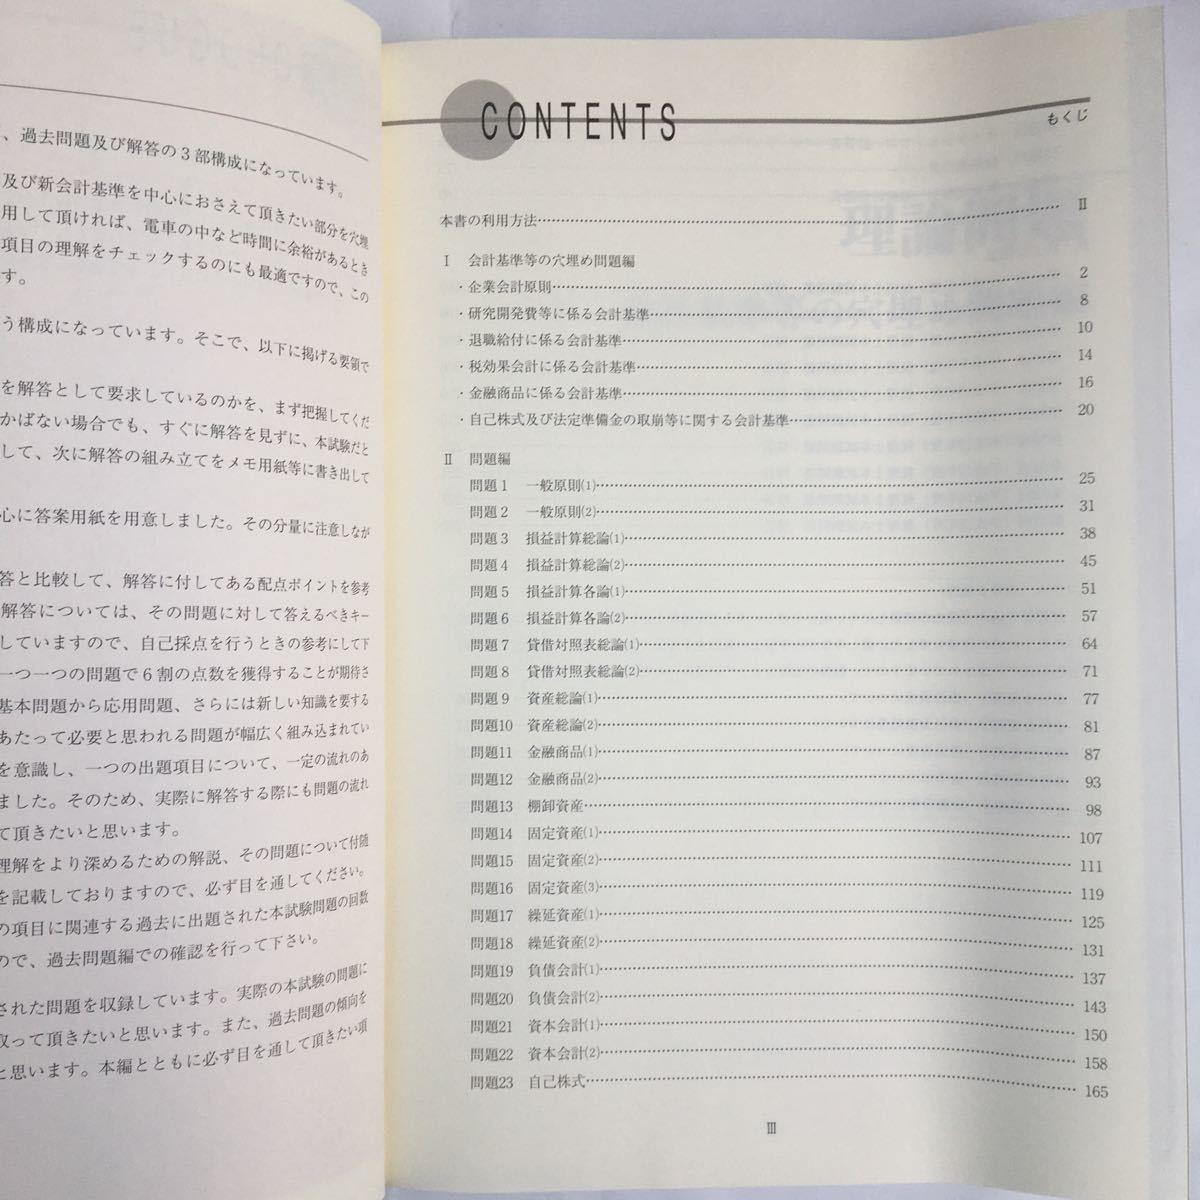 zaa-126♪財務諸表論理論問題集 (税理士試験受験対策シリーズ (平成16年度版)) 2004/4/1 大原税理士科 (編集)